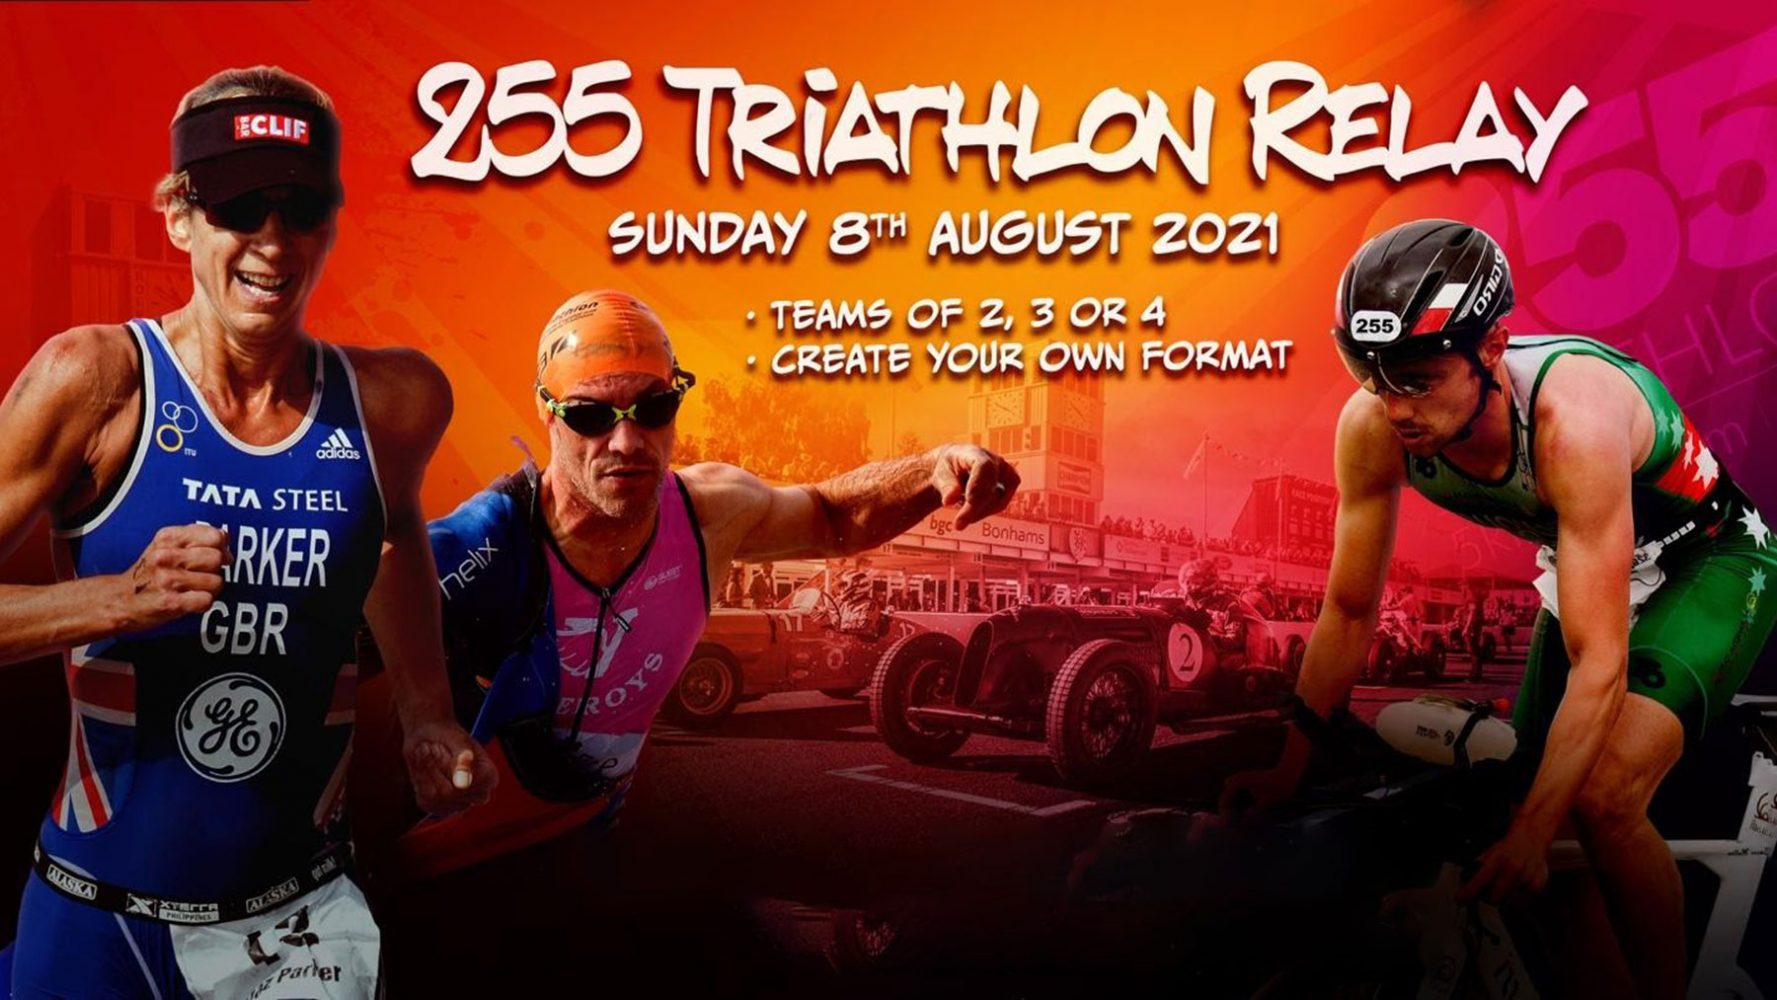 255 Triathlon Relay Race